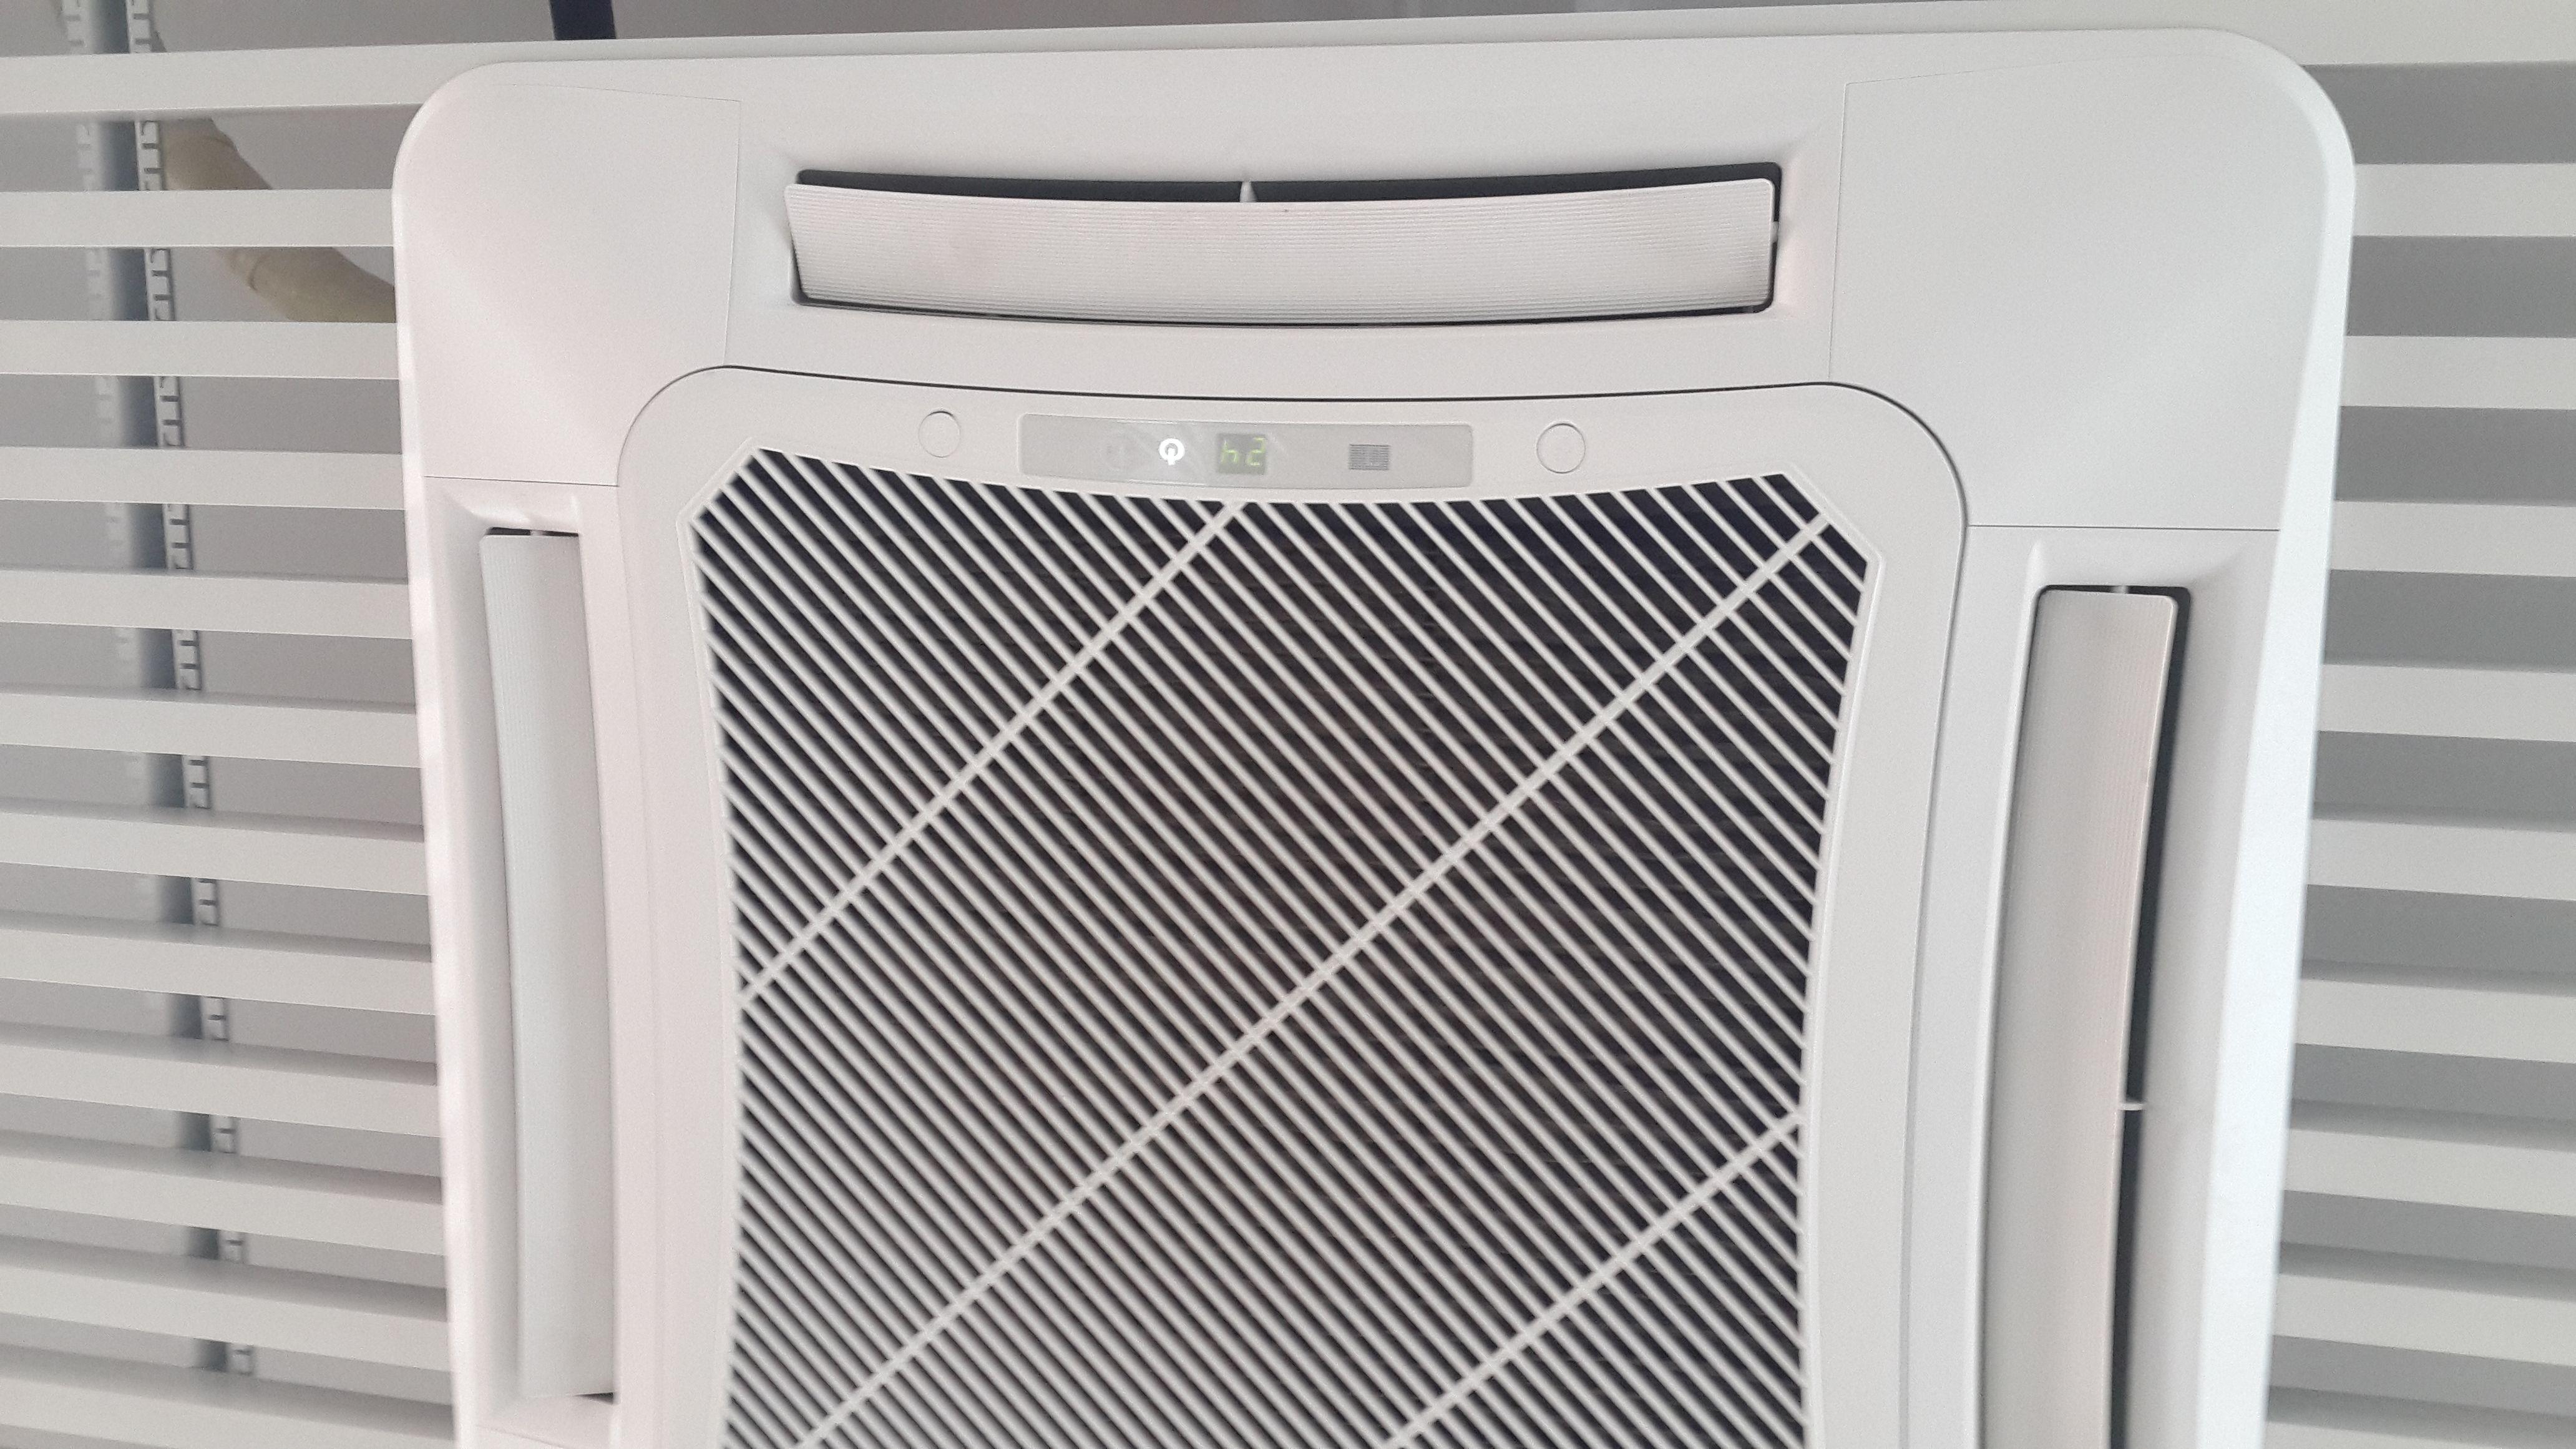 Air Conditioner Home appliances, Space heater, Air